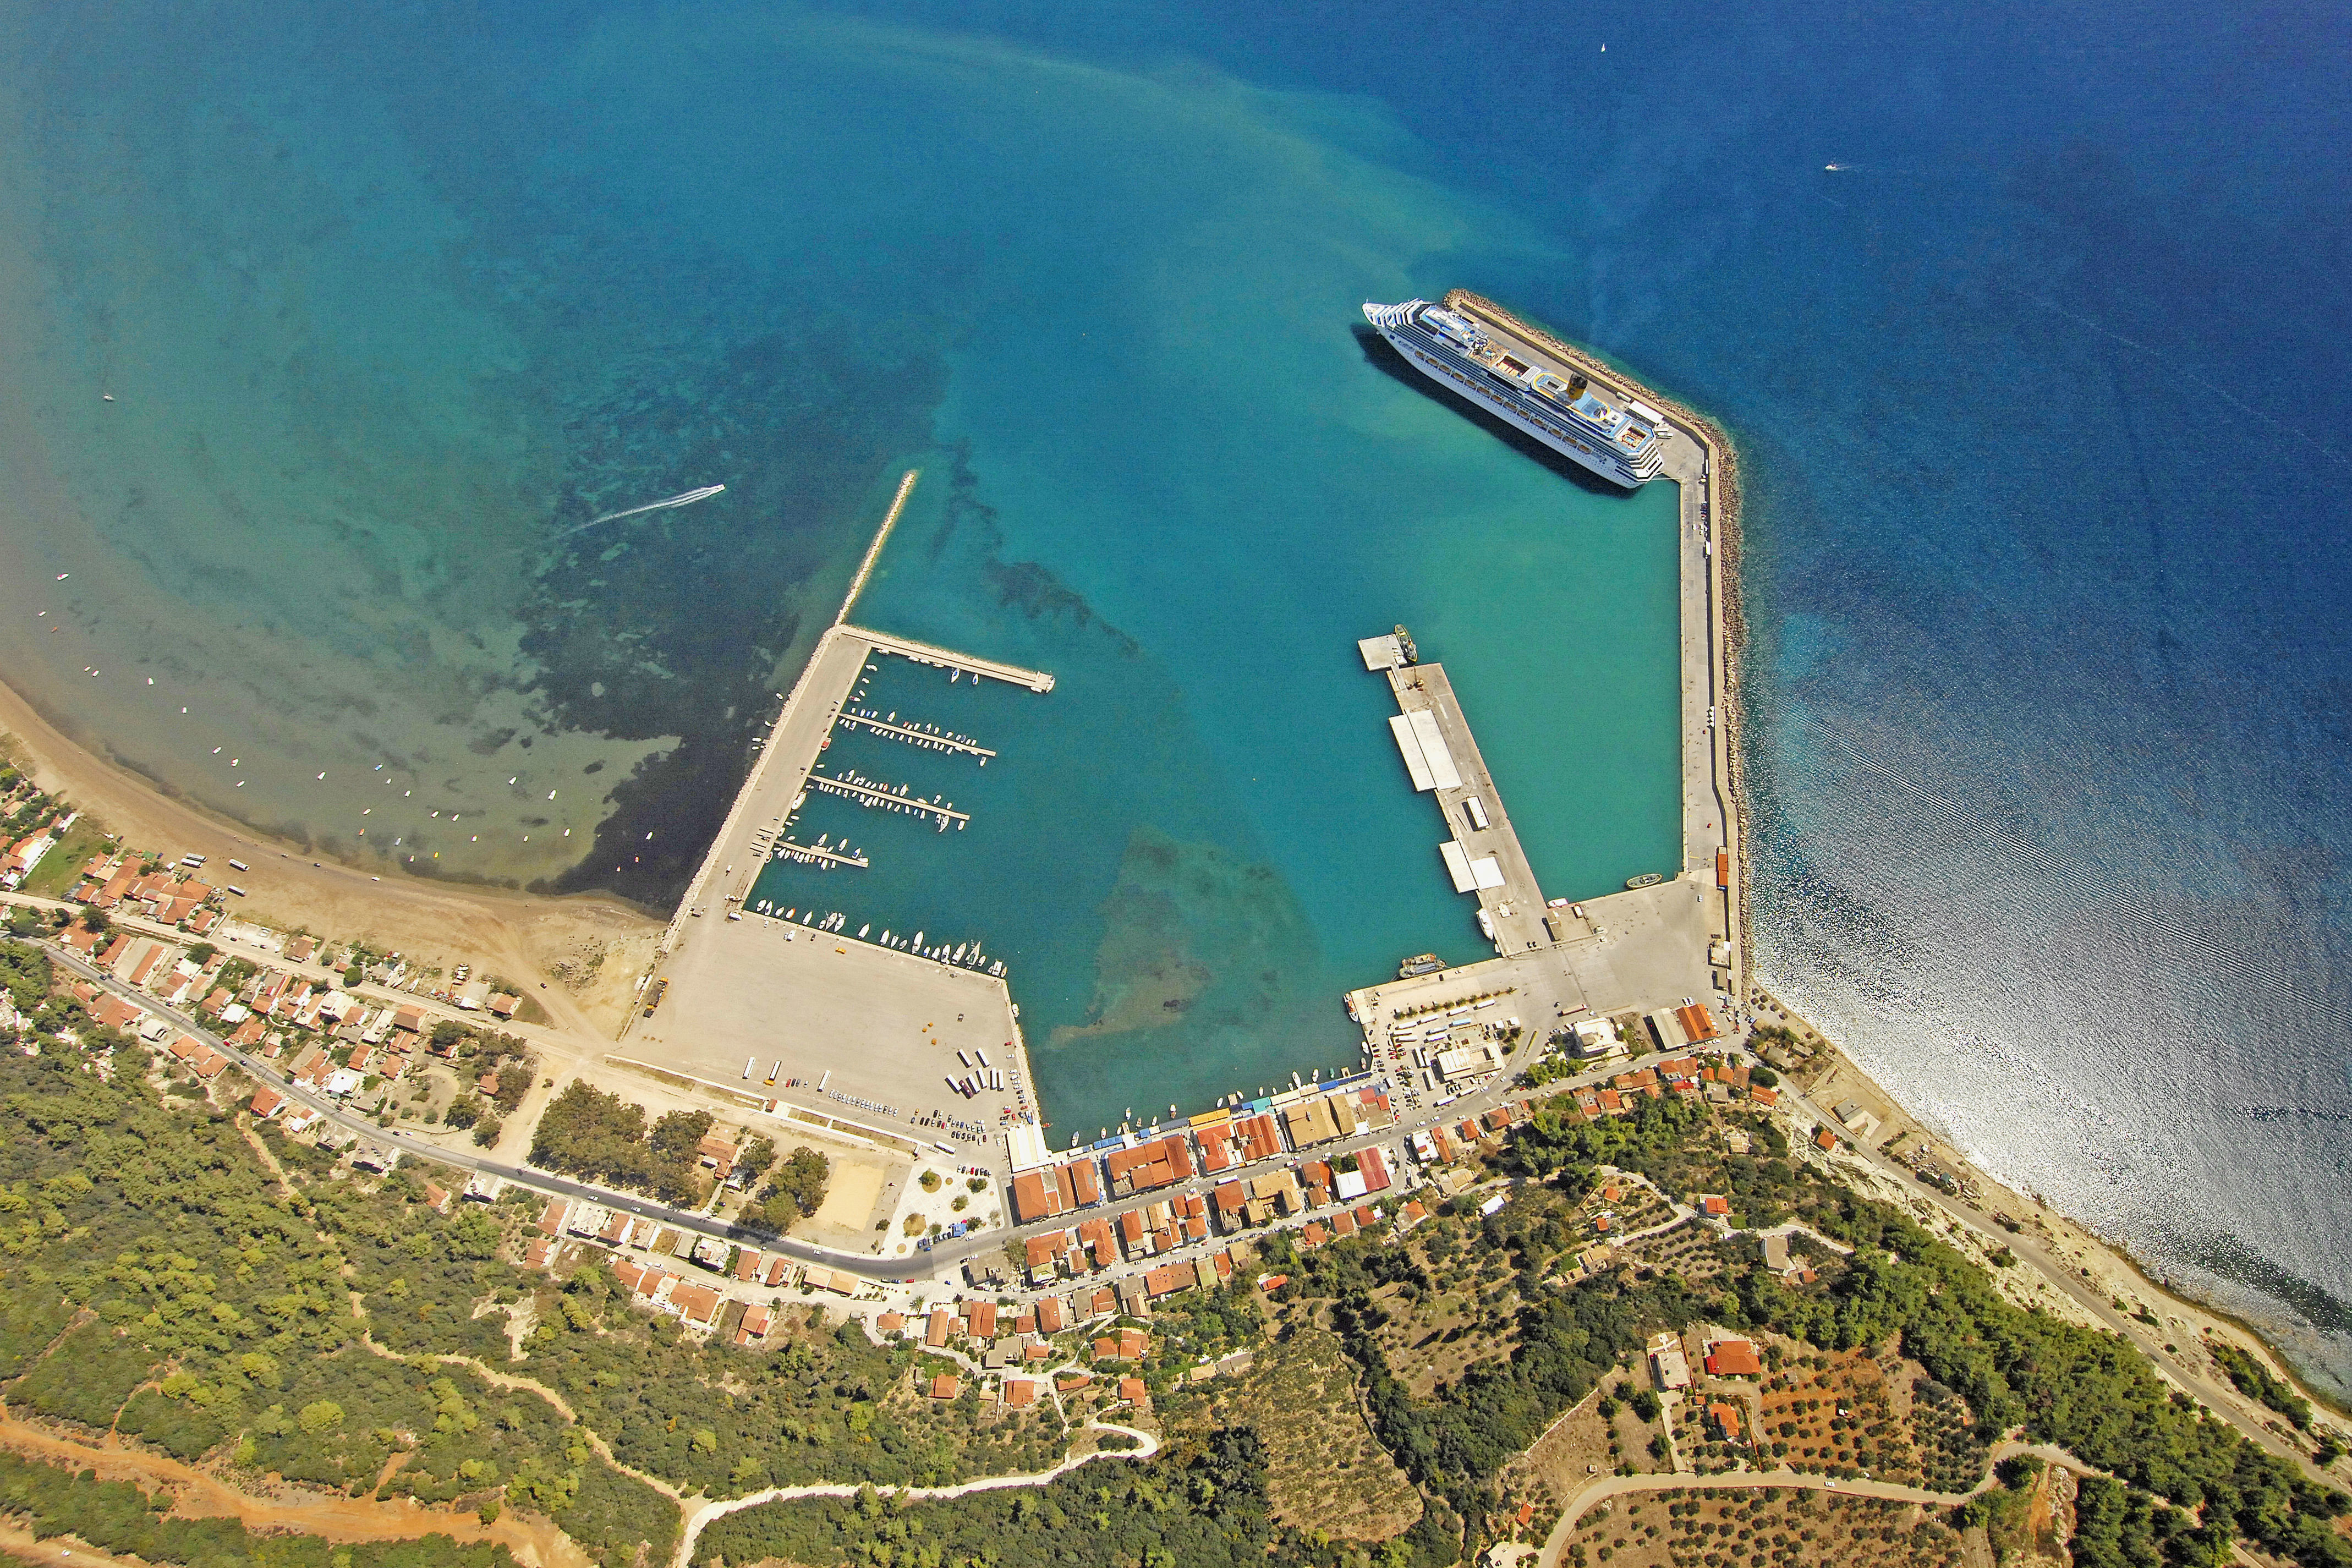 Katakolon cruise port of call – Cruise port guide   ShoreBee